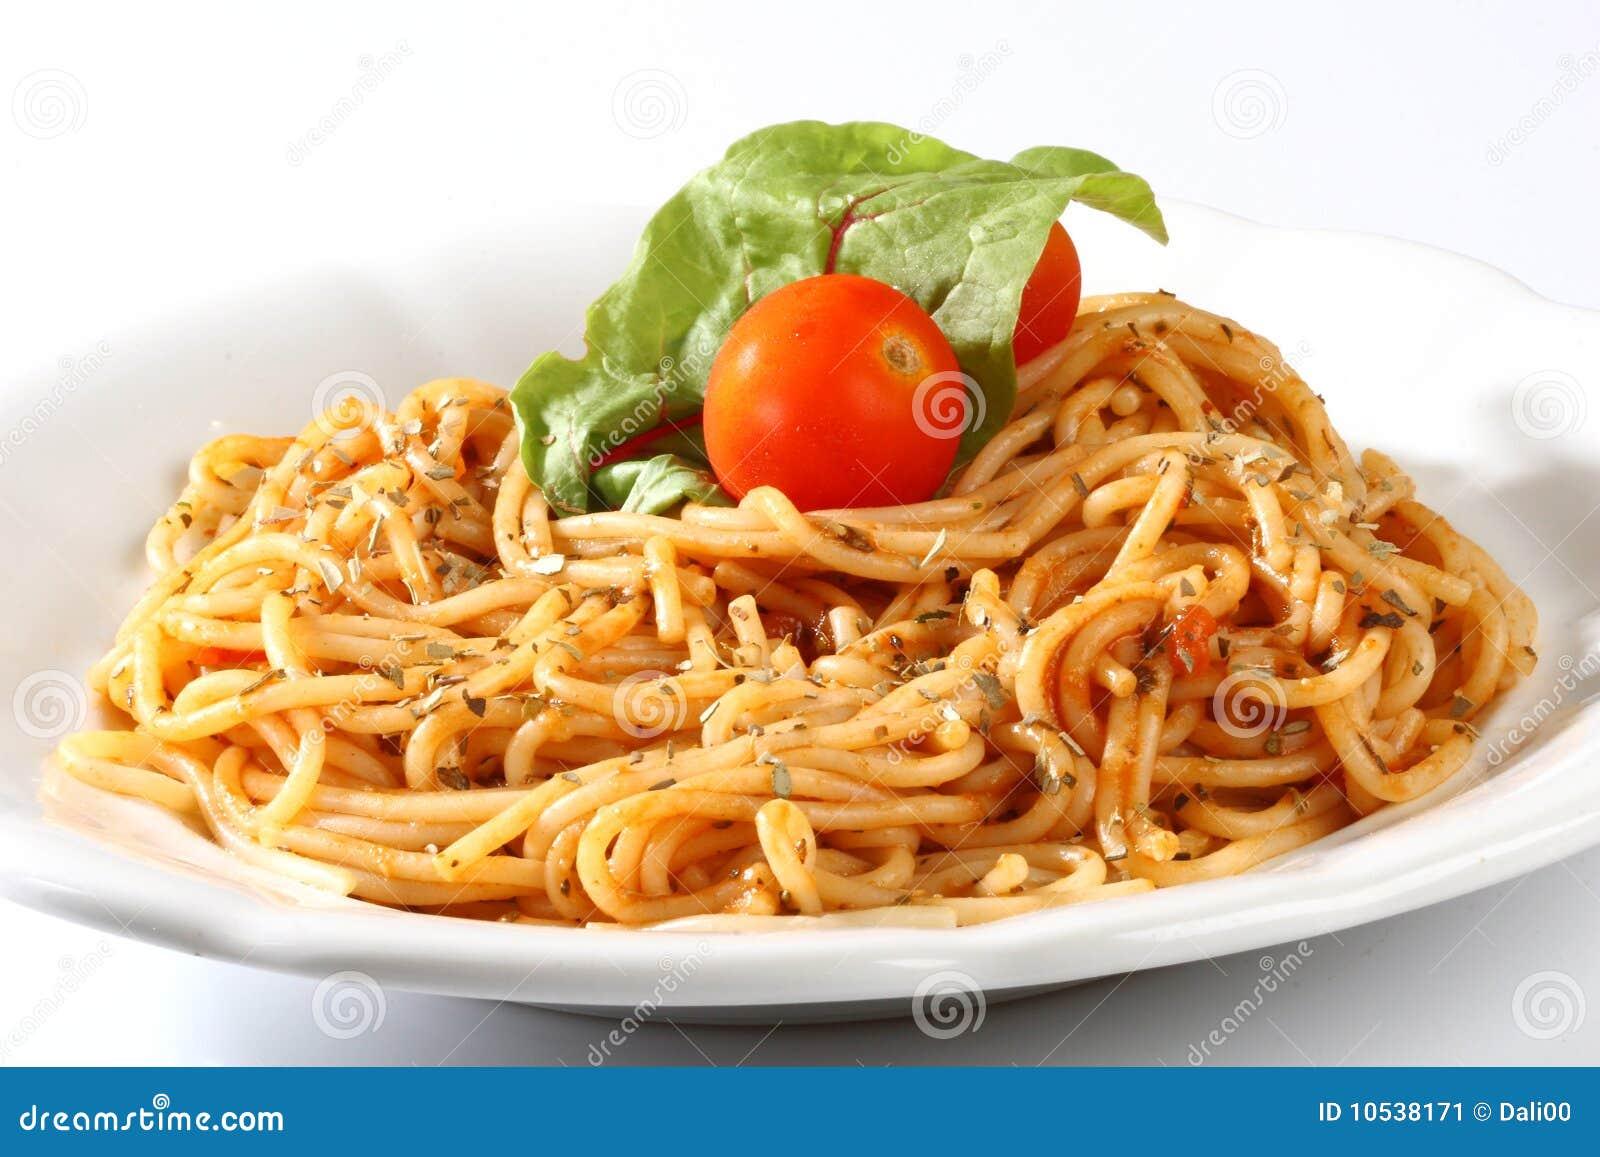 delicious pasta